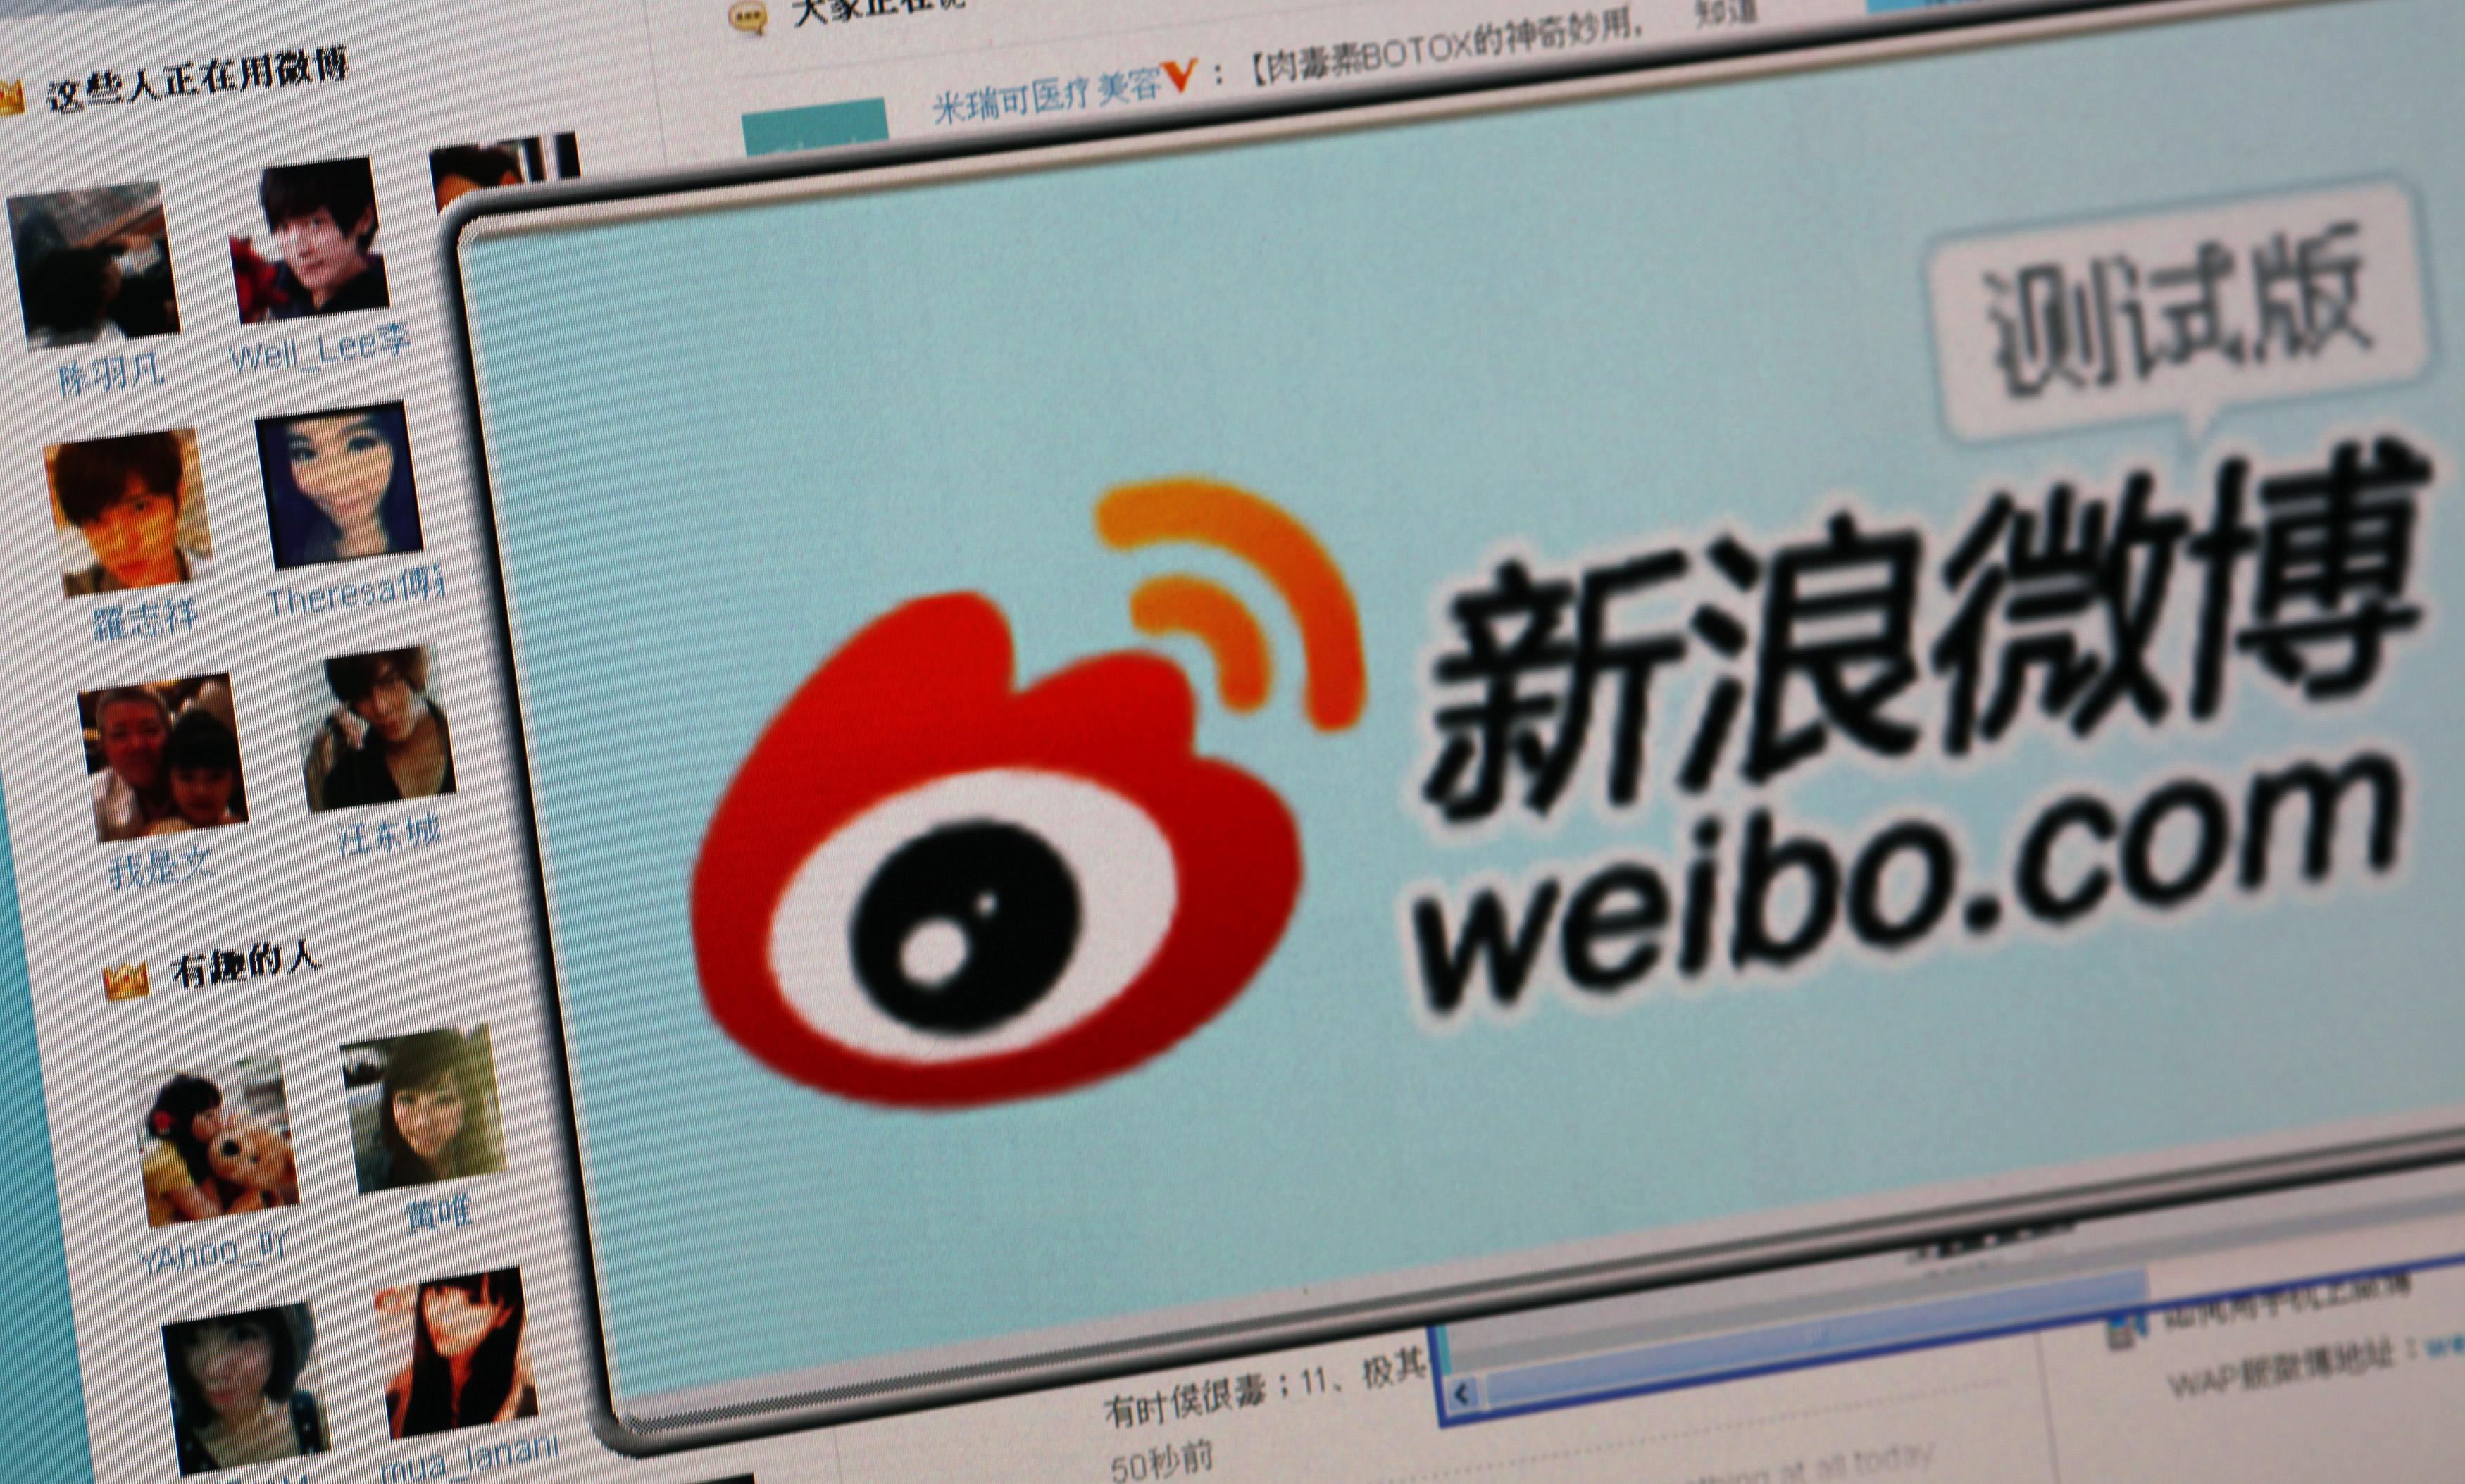 Da preschent ha Weibo passa 129 milliuns users activs.